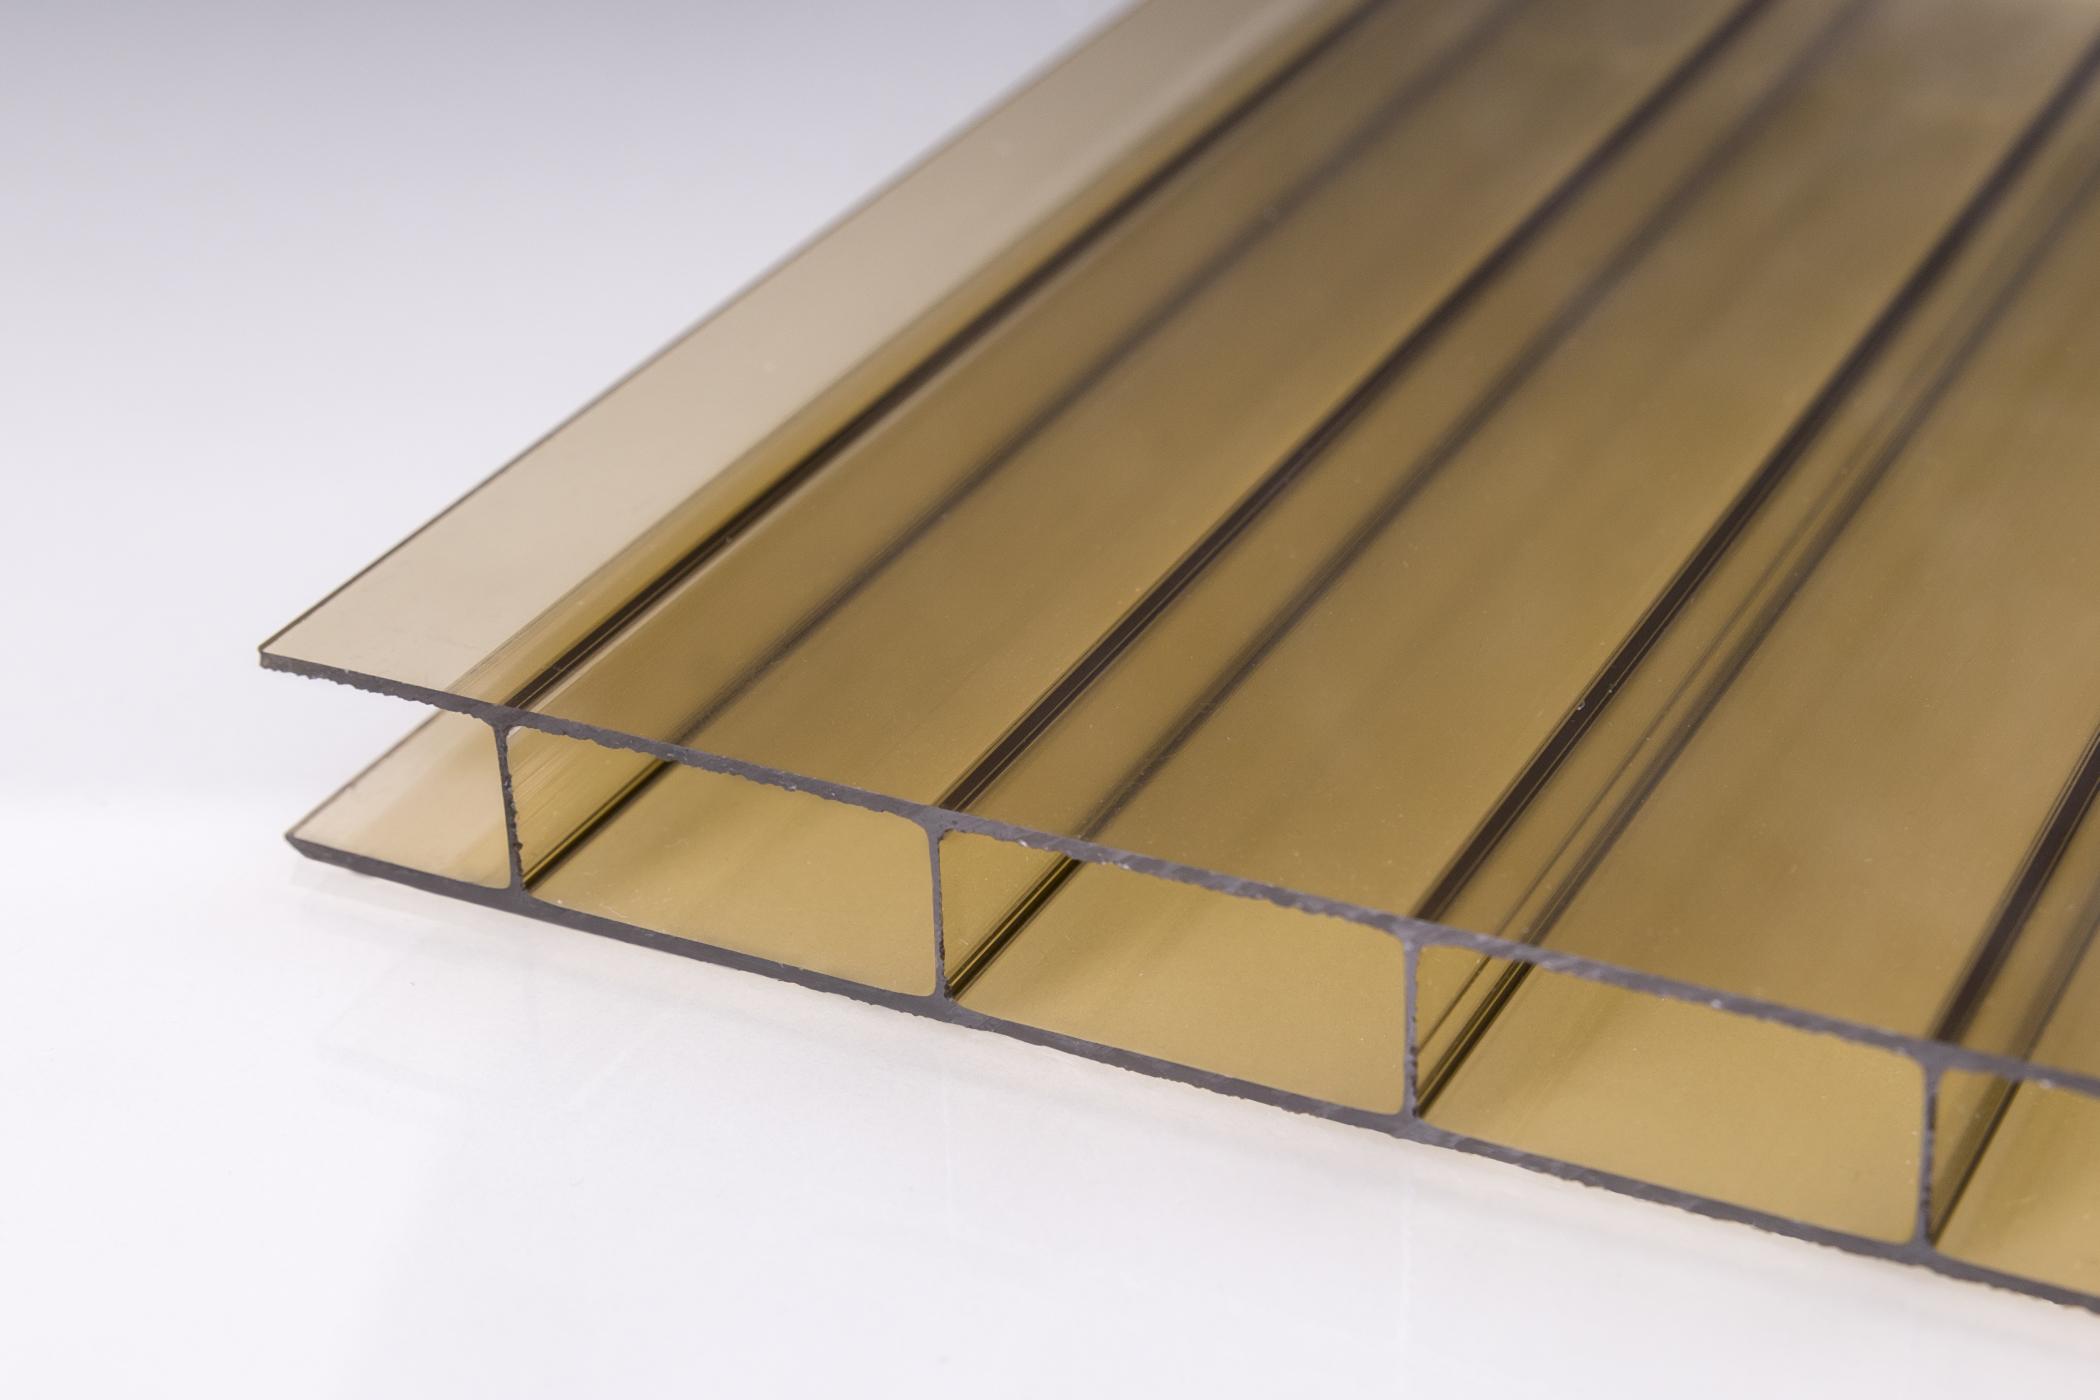 m ller kunststoffe 16 mm stegplatten aus acrylglas 16 32 bronze online kaufen. Black Bedroom Furniture Sets. Home Design Ideas